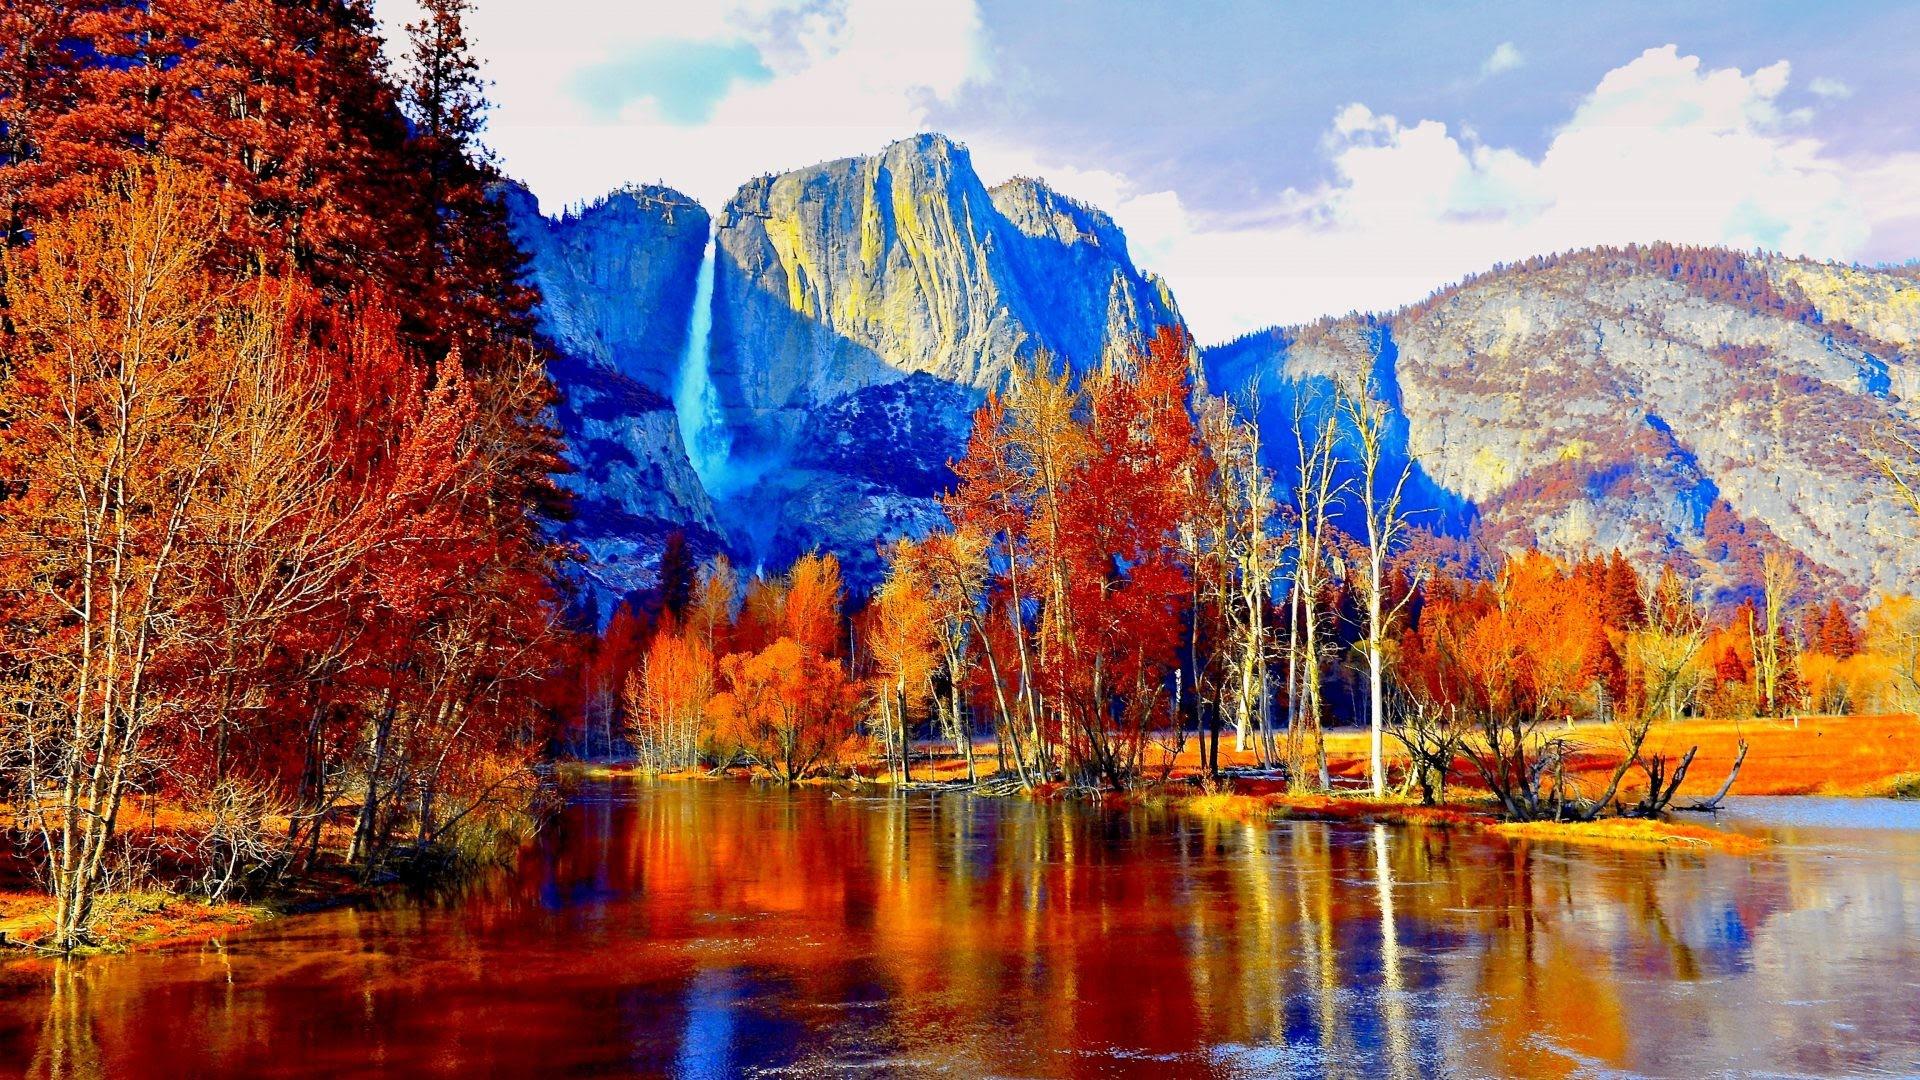 HD 1920X1080 Yosemite Wallpaper Free